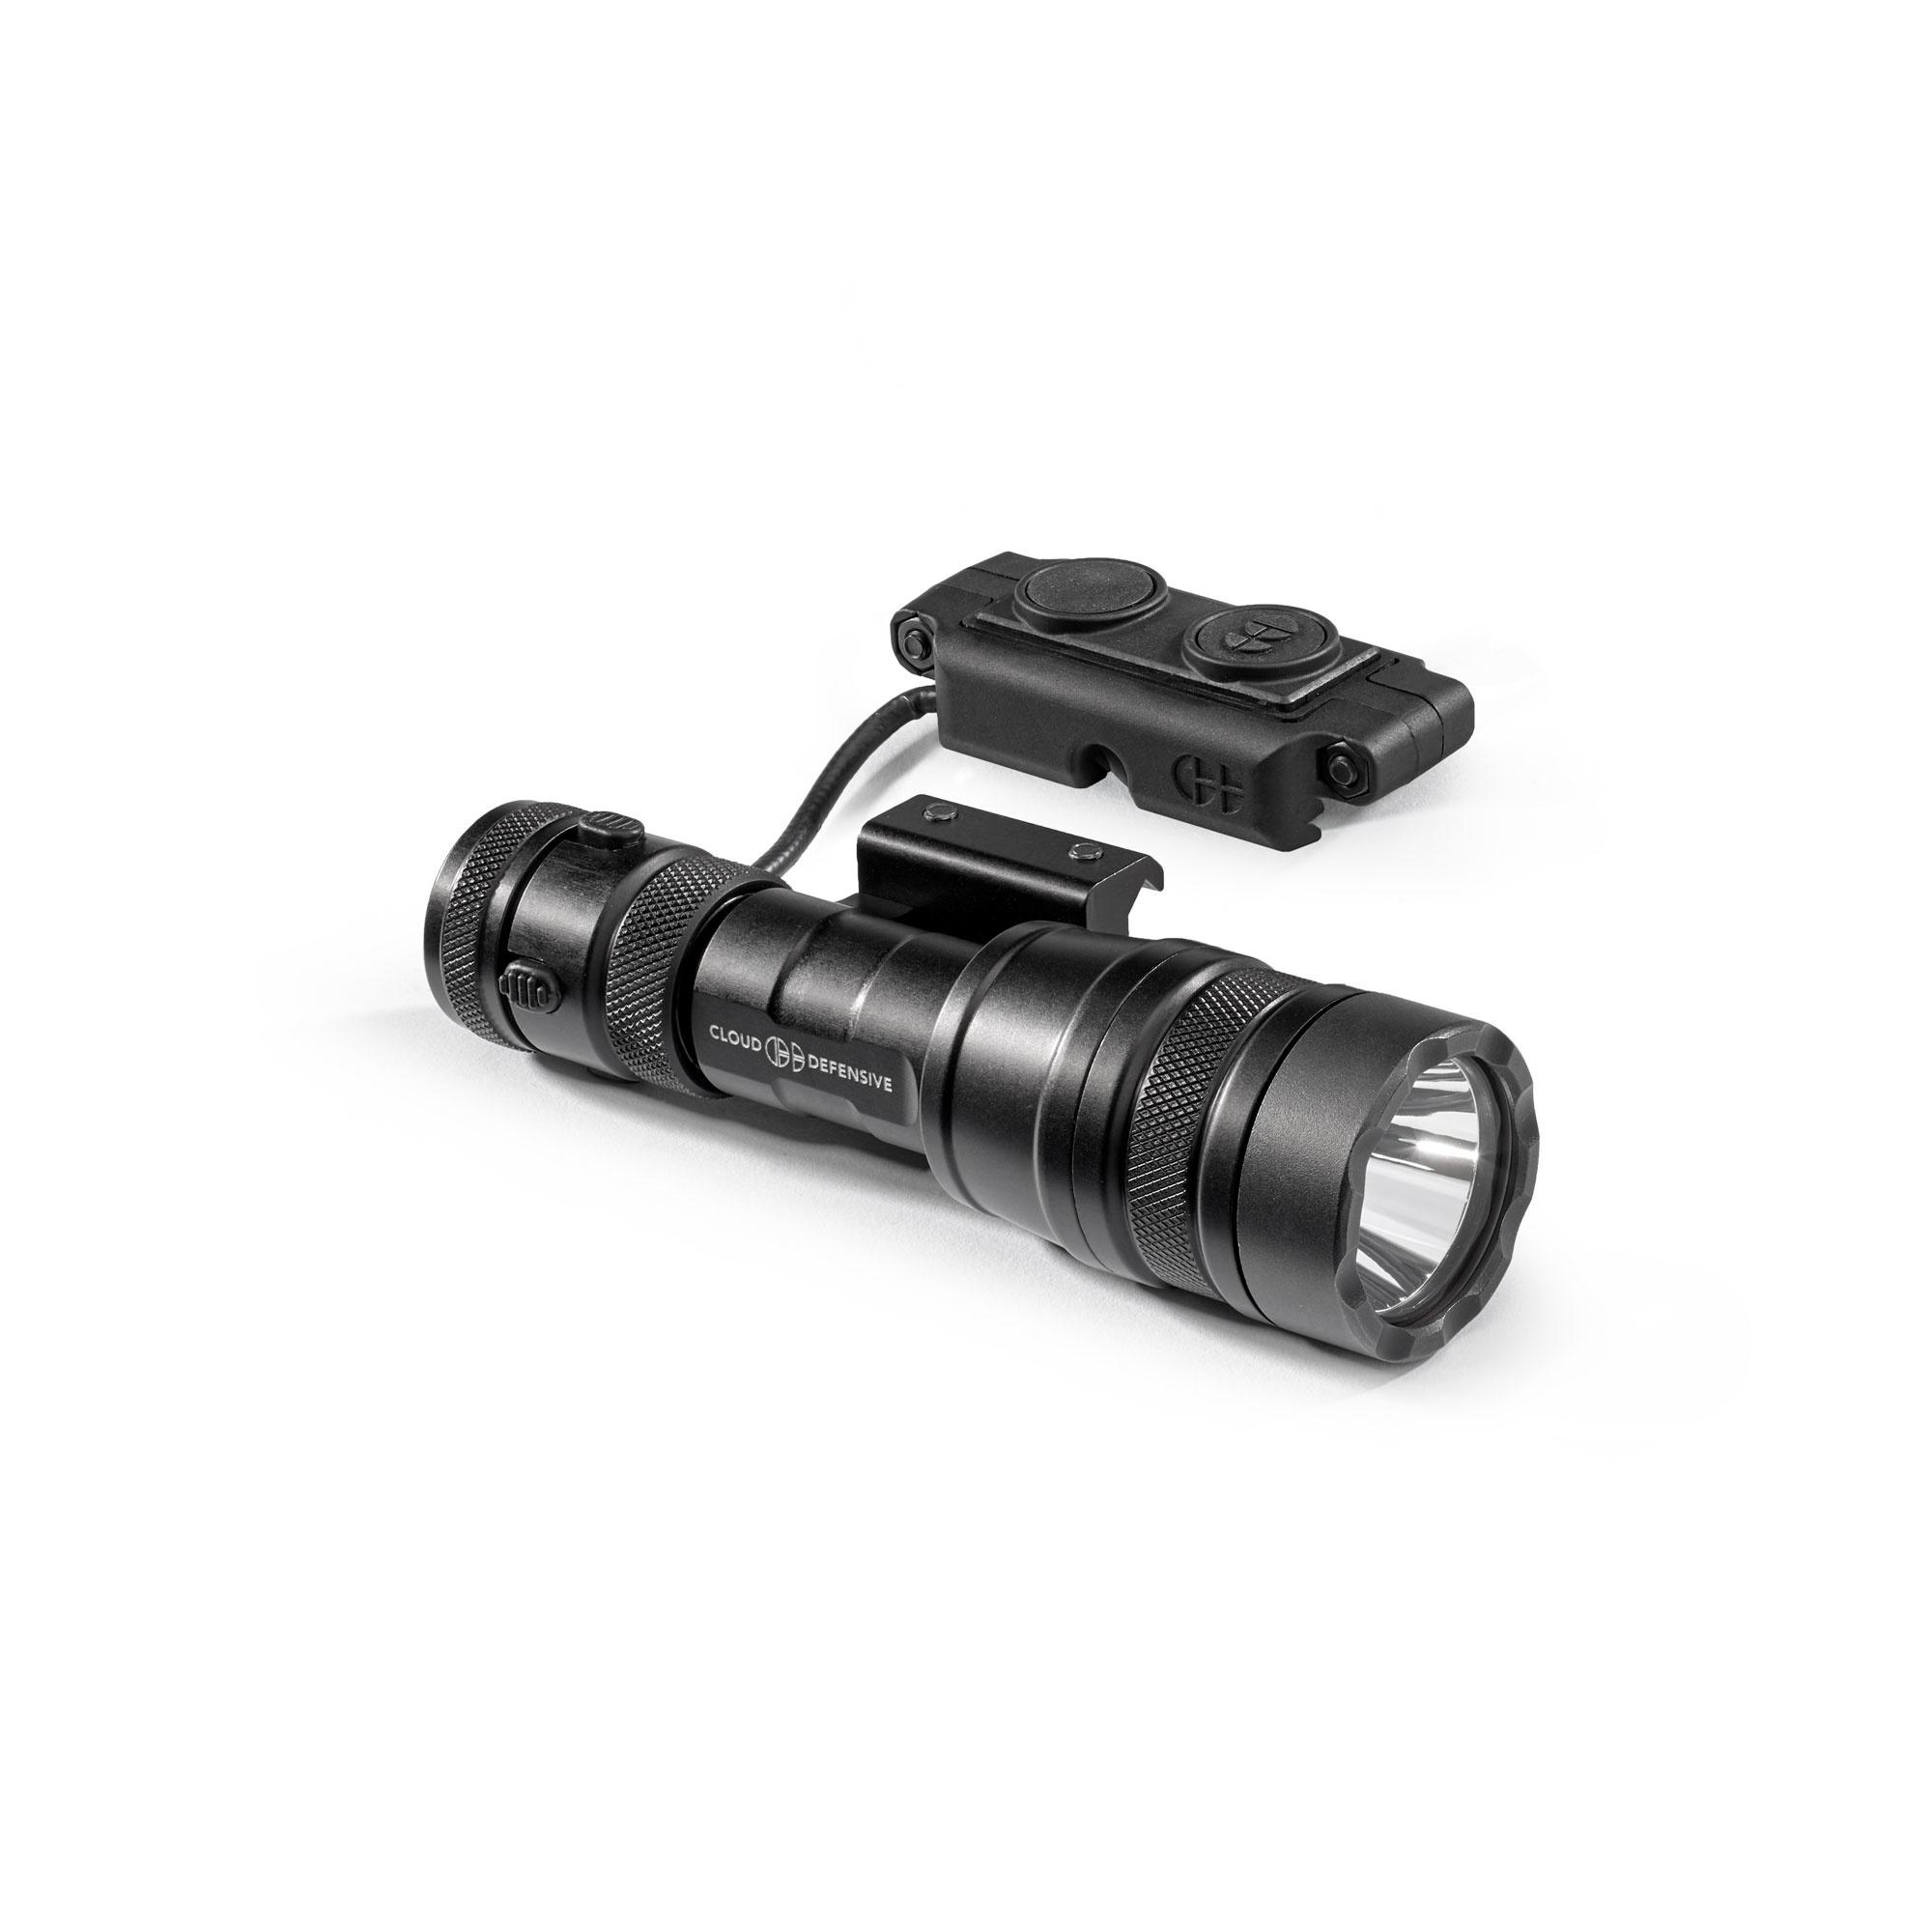 Cloud Defensive Cloud Defensive REIN micro weapon light kit